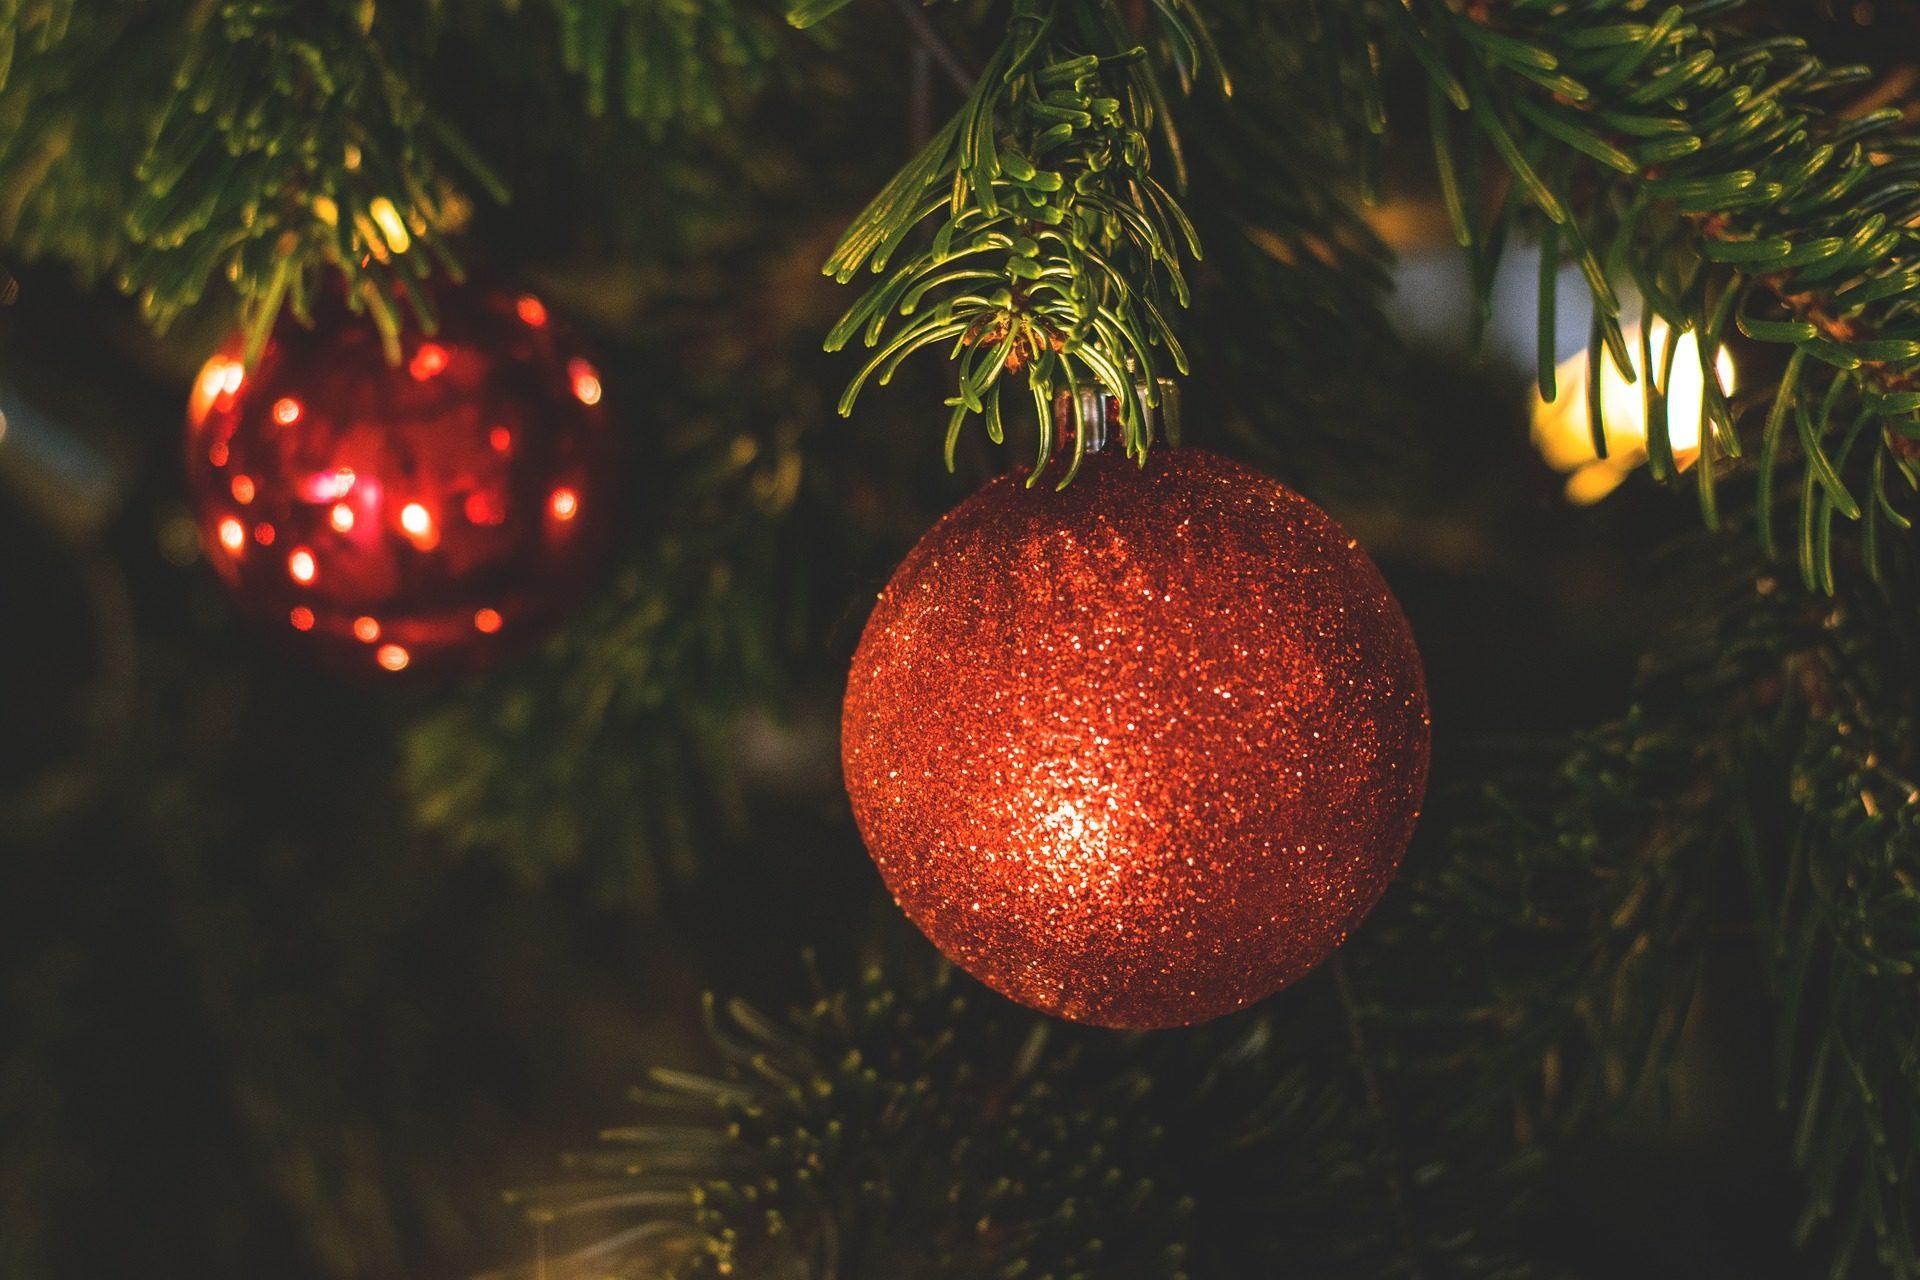 Fondo de pantalla de bolas rbol abeto brillos rojas for Nostalgische weihnachtskugeln